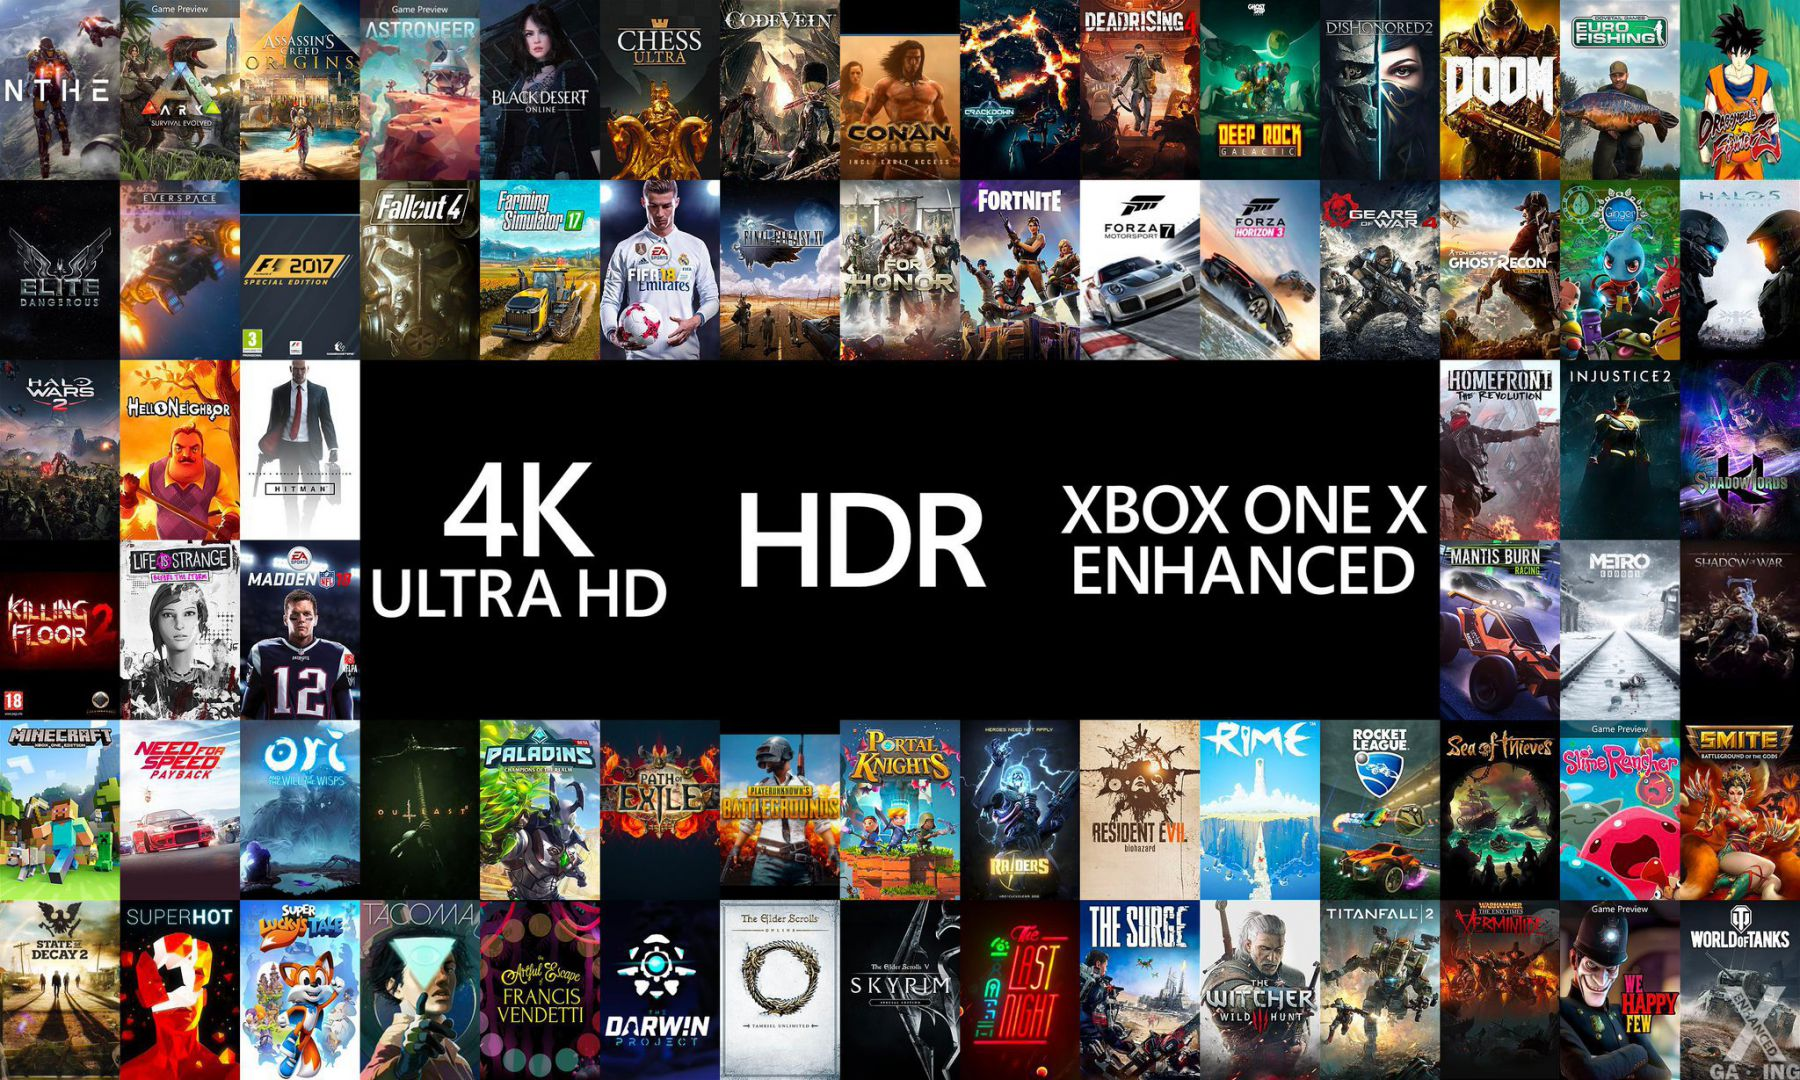 Xbox Enhaced